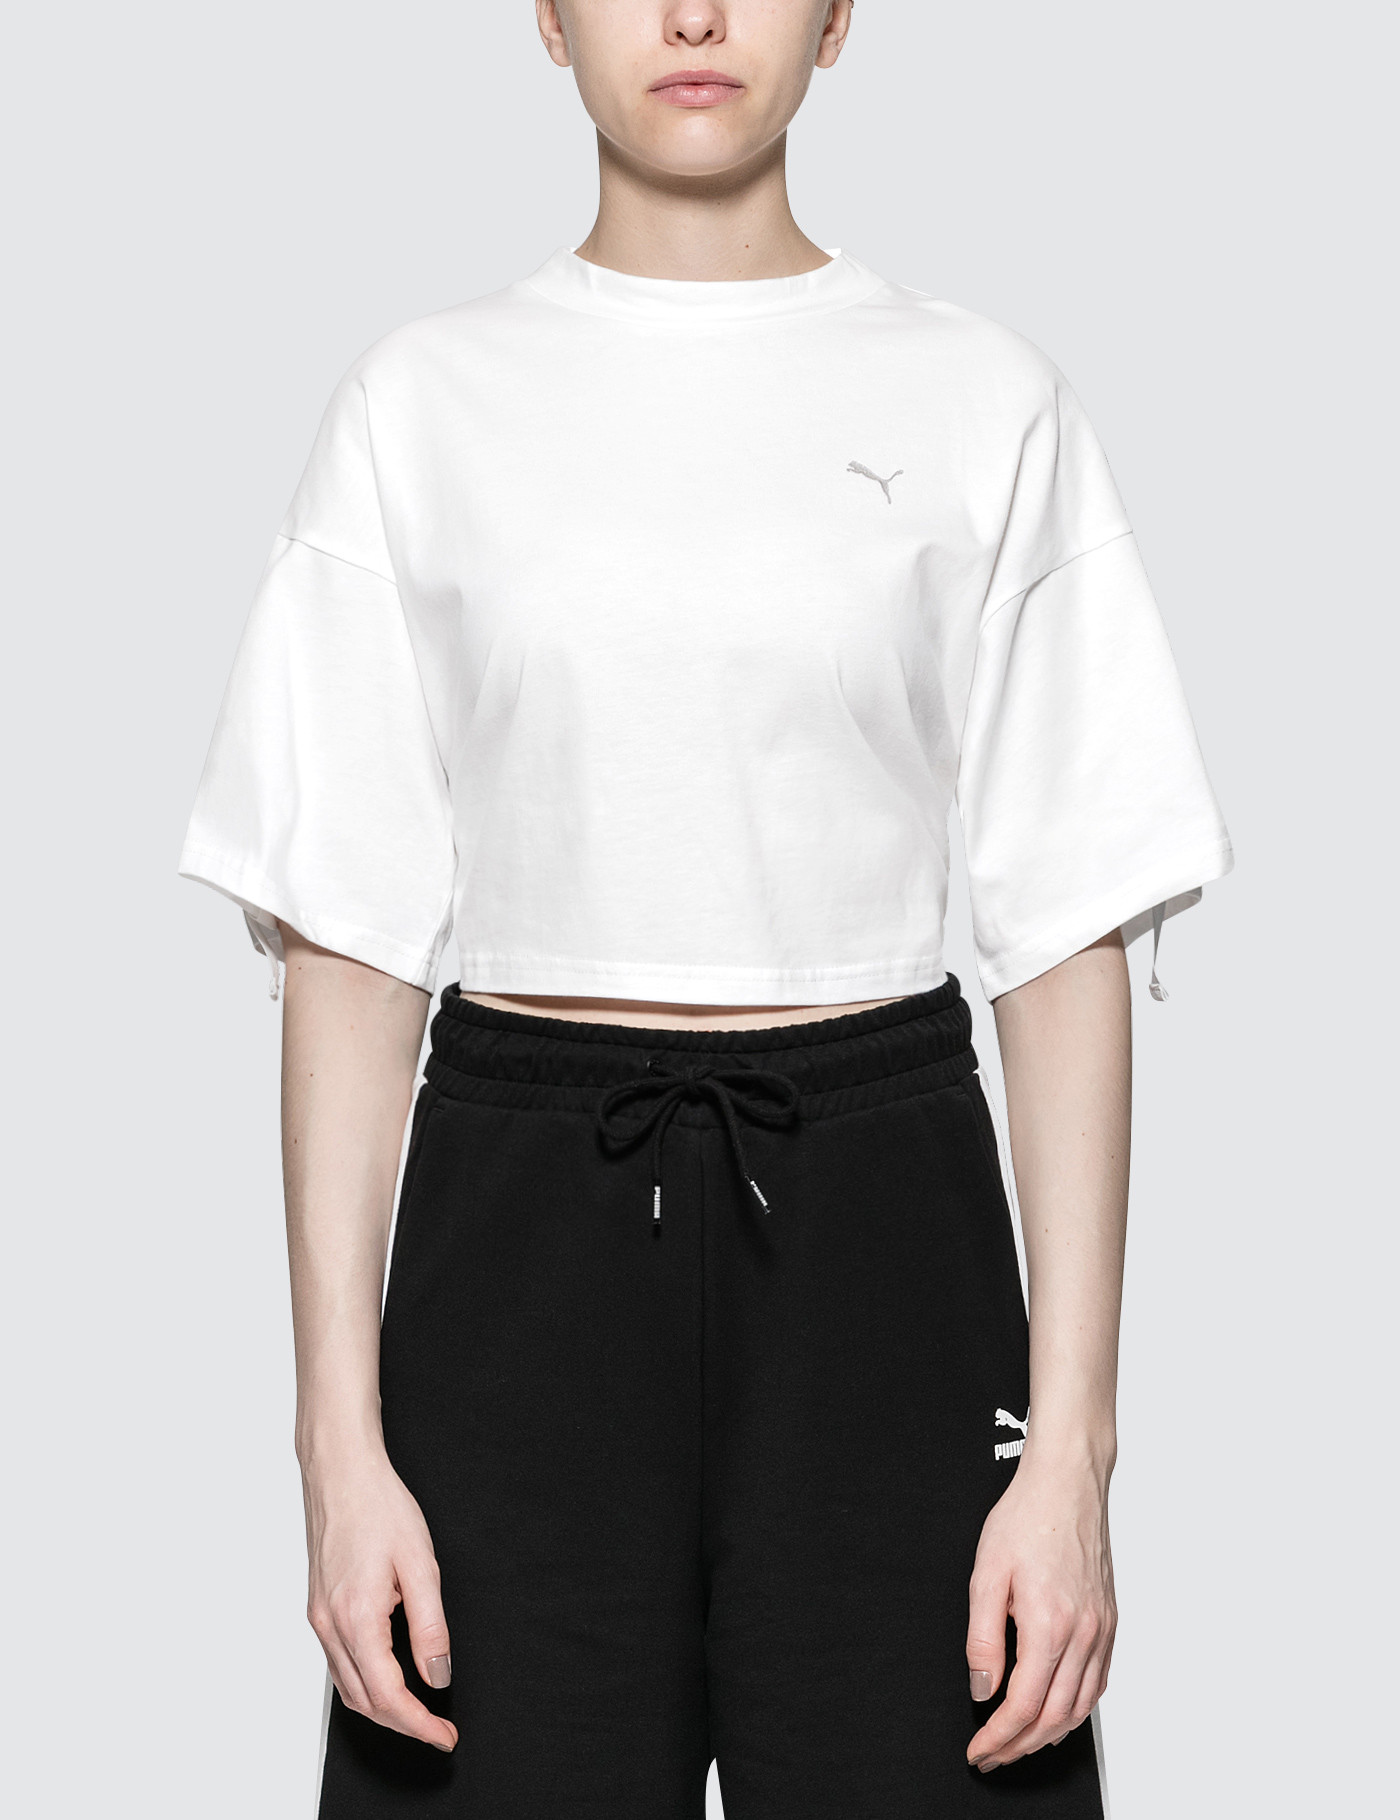 En Pointe Cropped S/S T-Shirt